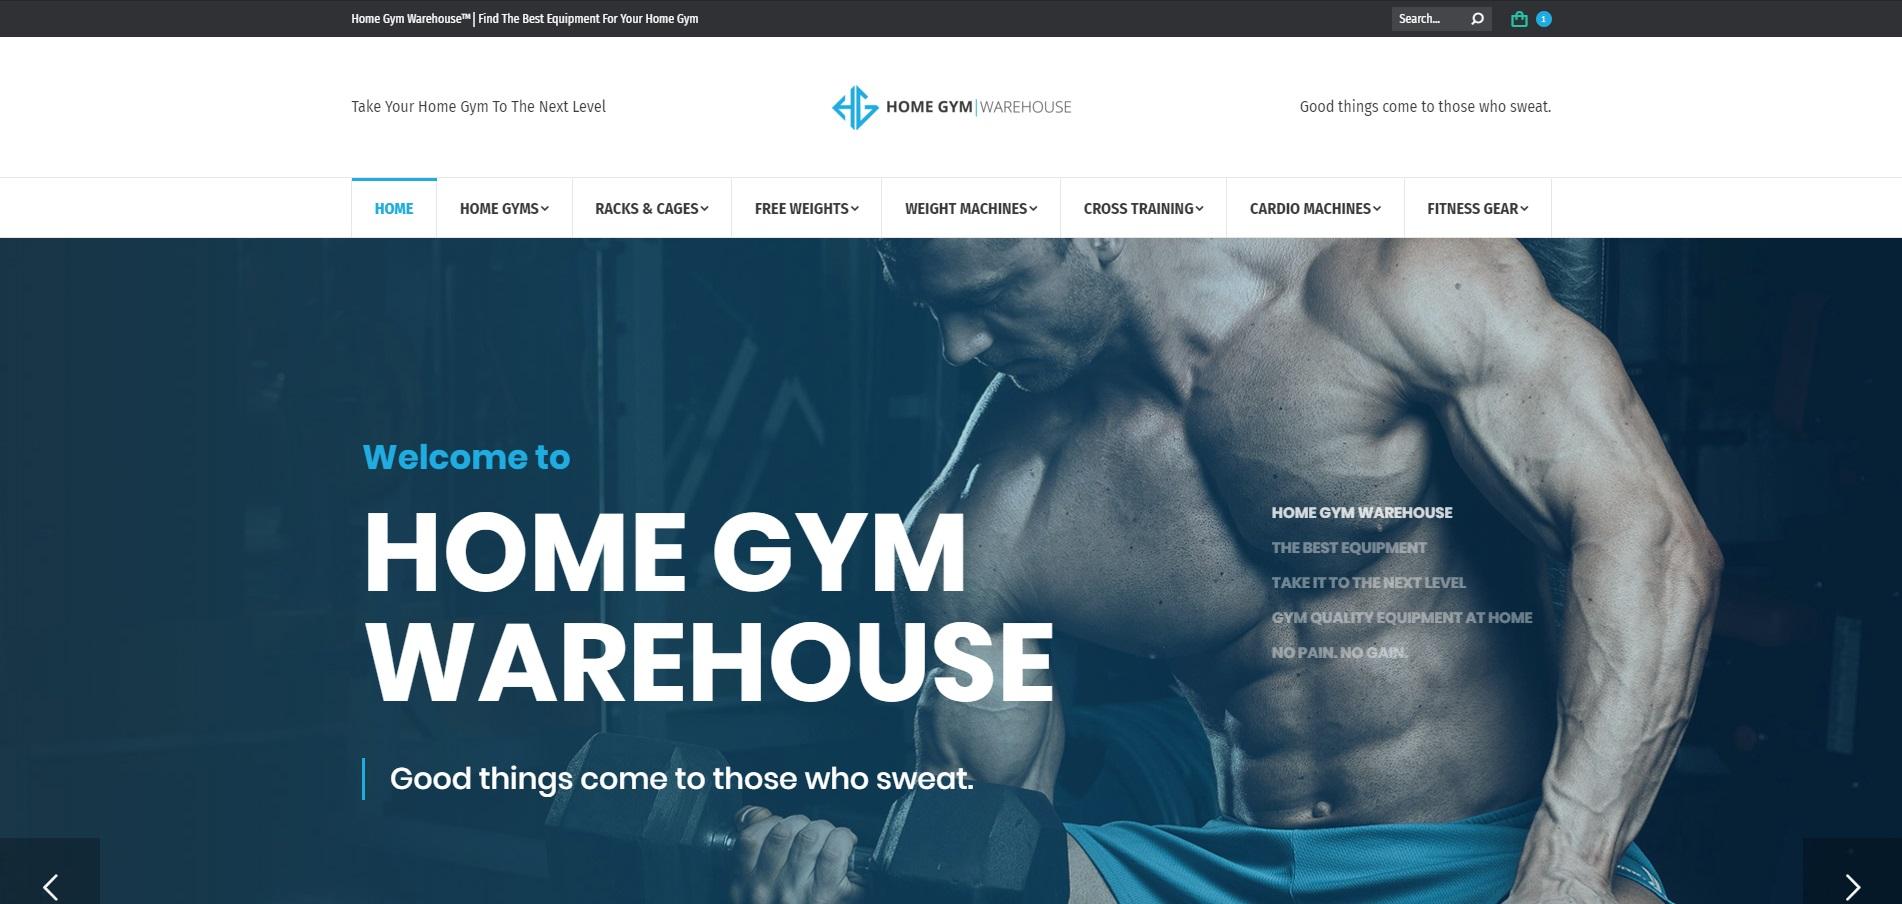 Home Gym Warehouse™